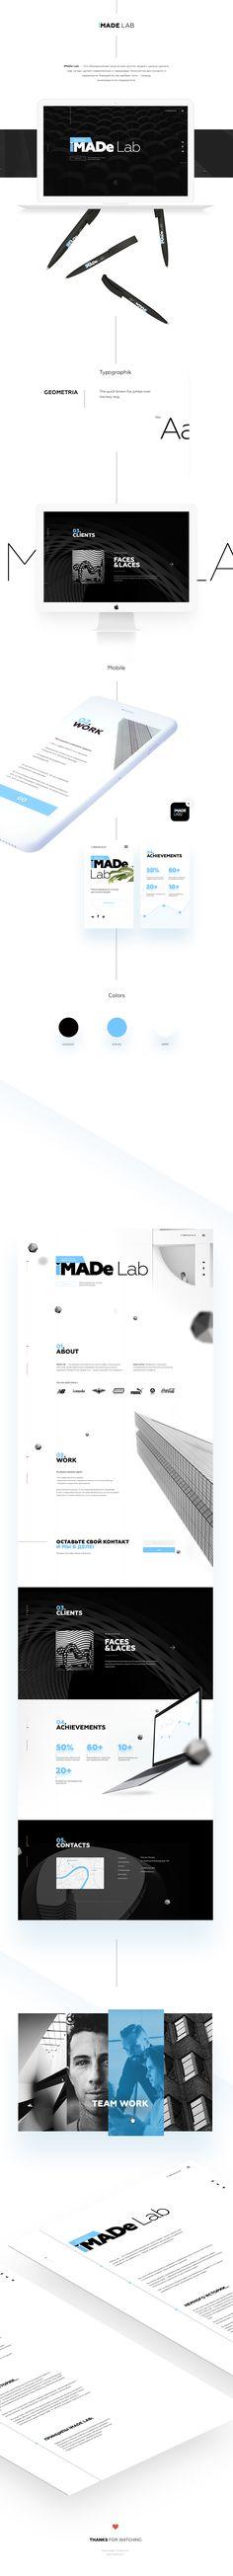 Ознакомьтесь с моим проектом @Behance: «iMADE Lab. Website» https://www.behance.net/gallery/48556173/iMADE-Lab-Website